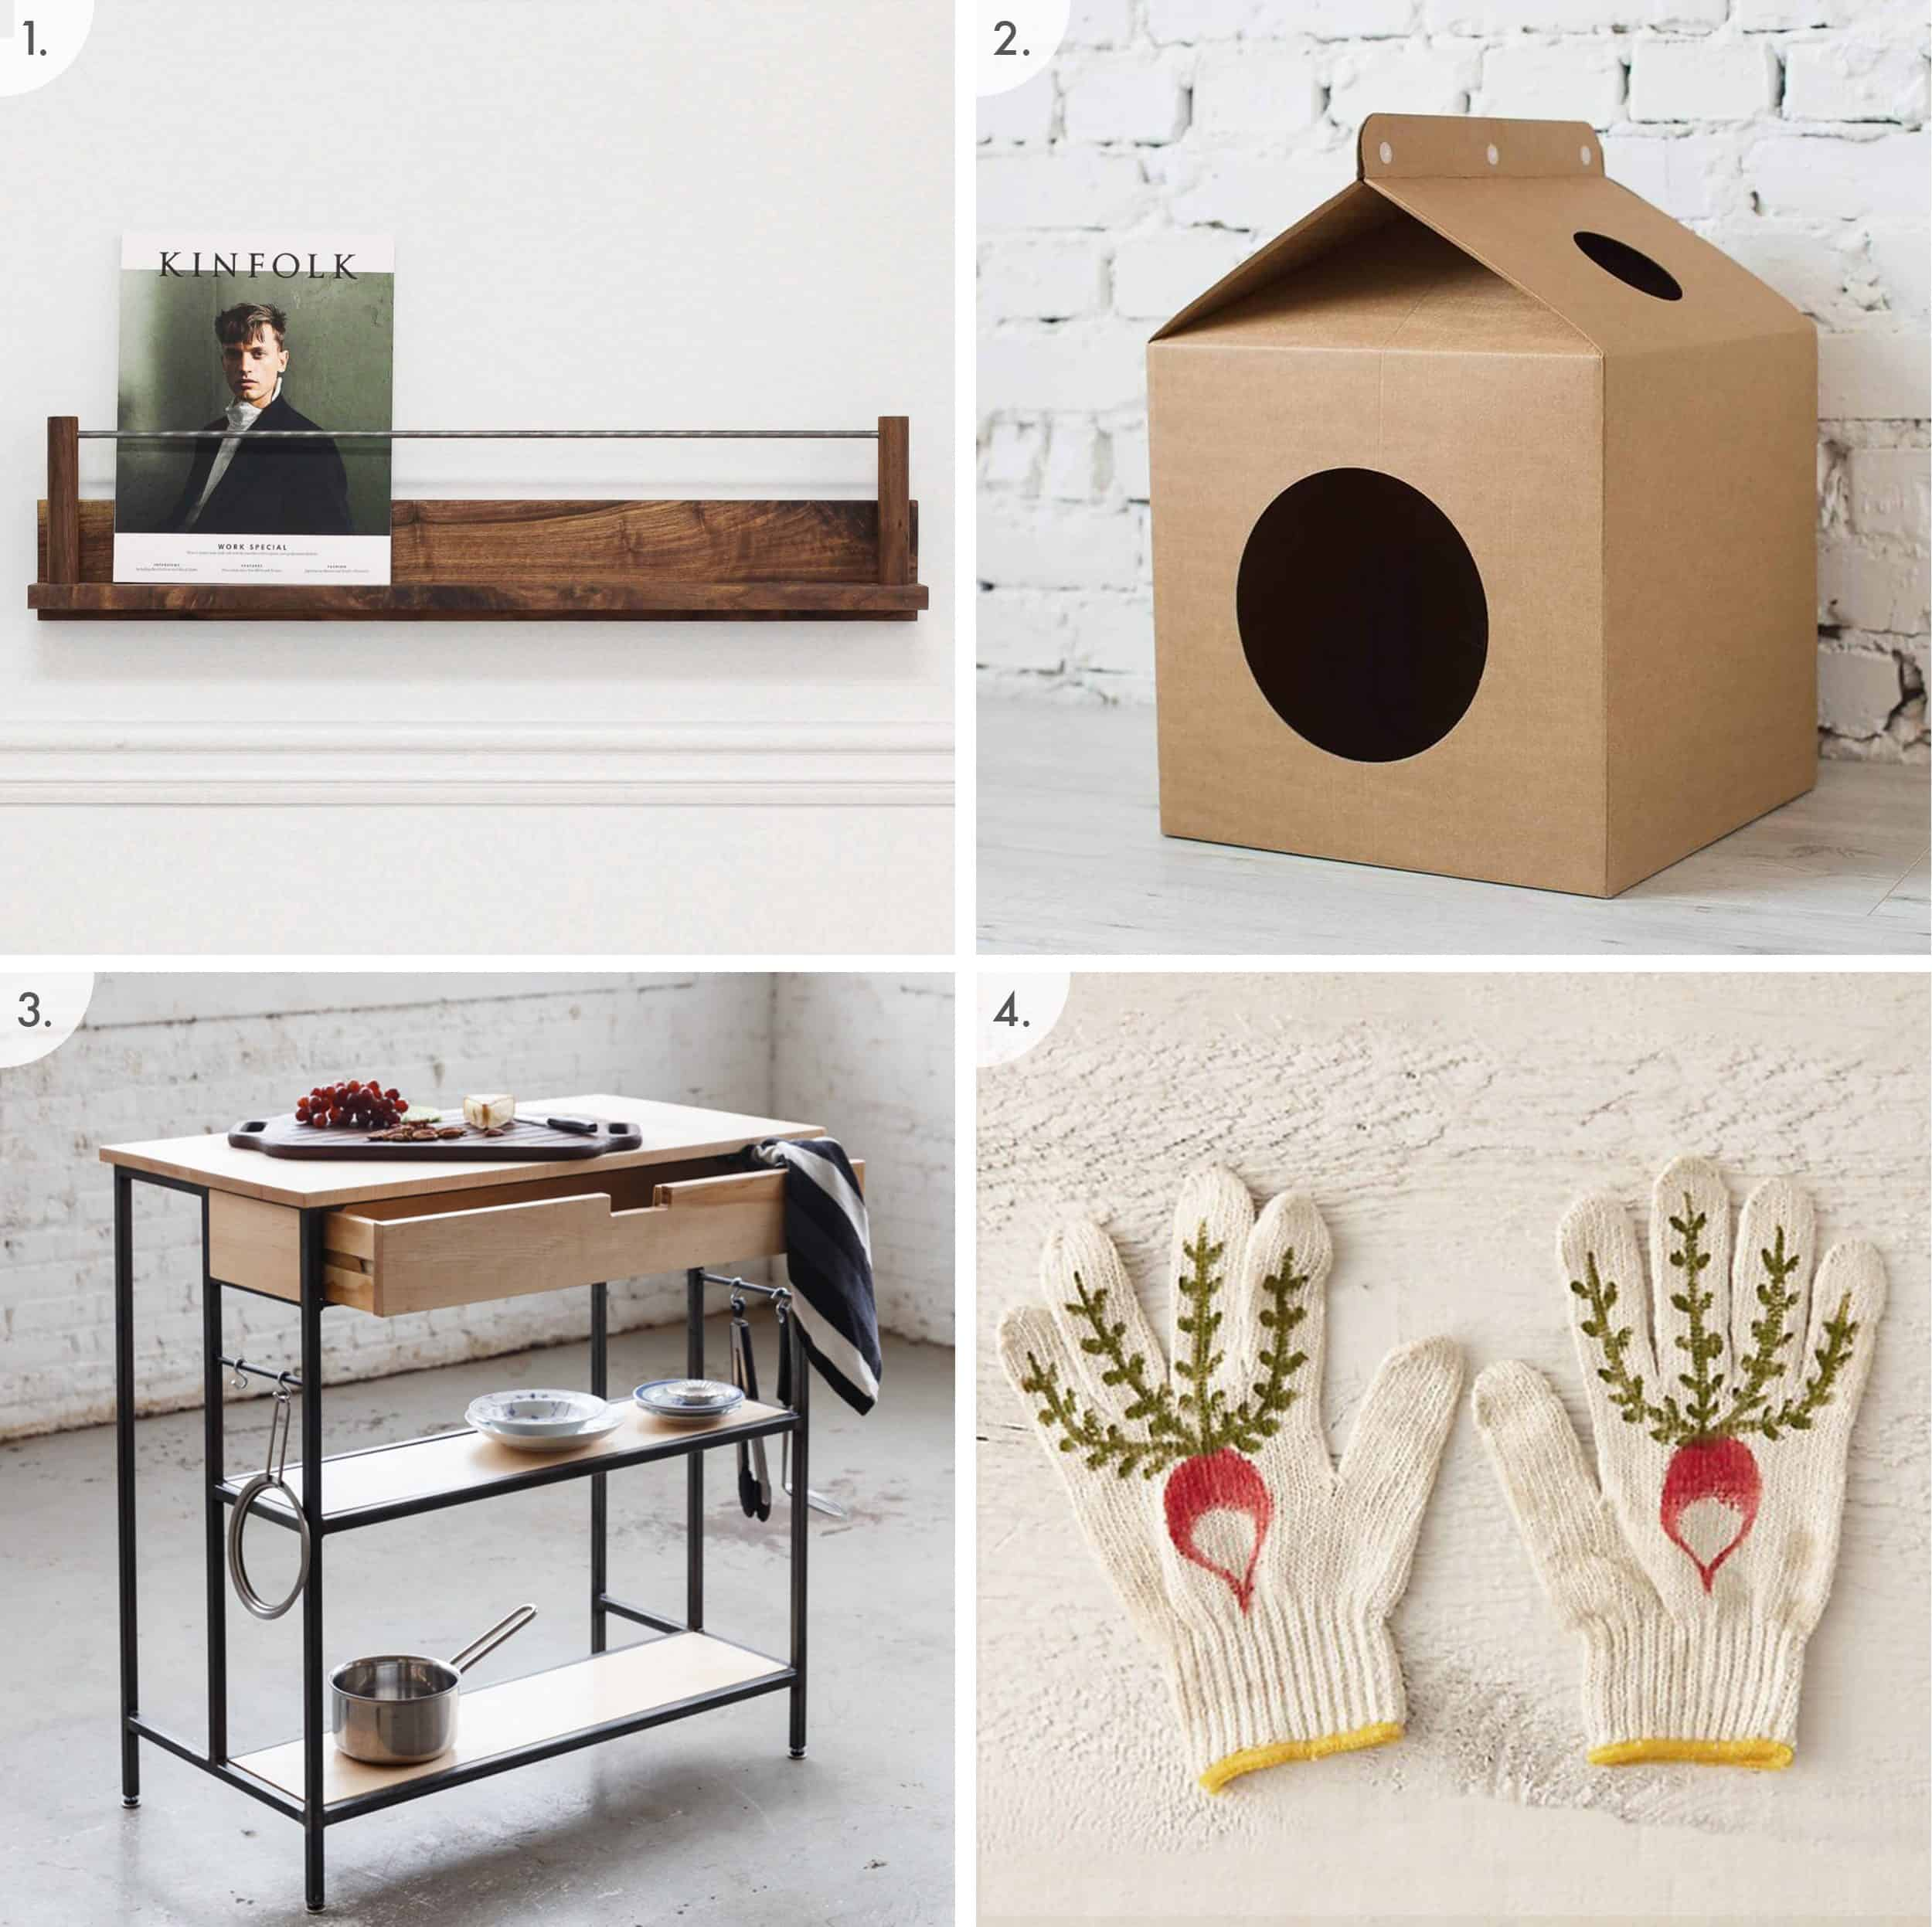 Shelf Cat Gloves Kitchen1 2500x2494